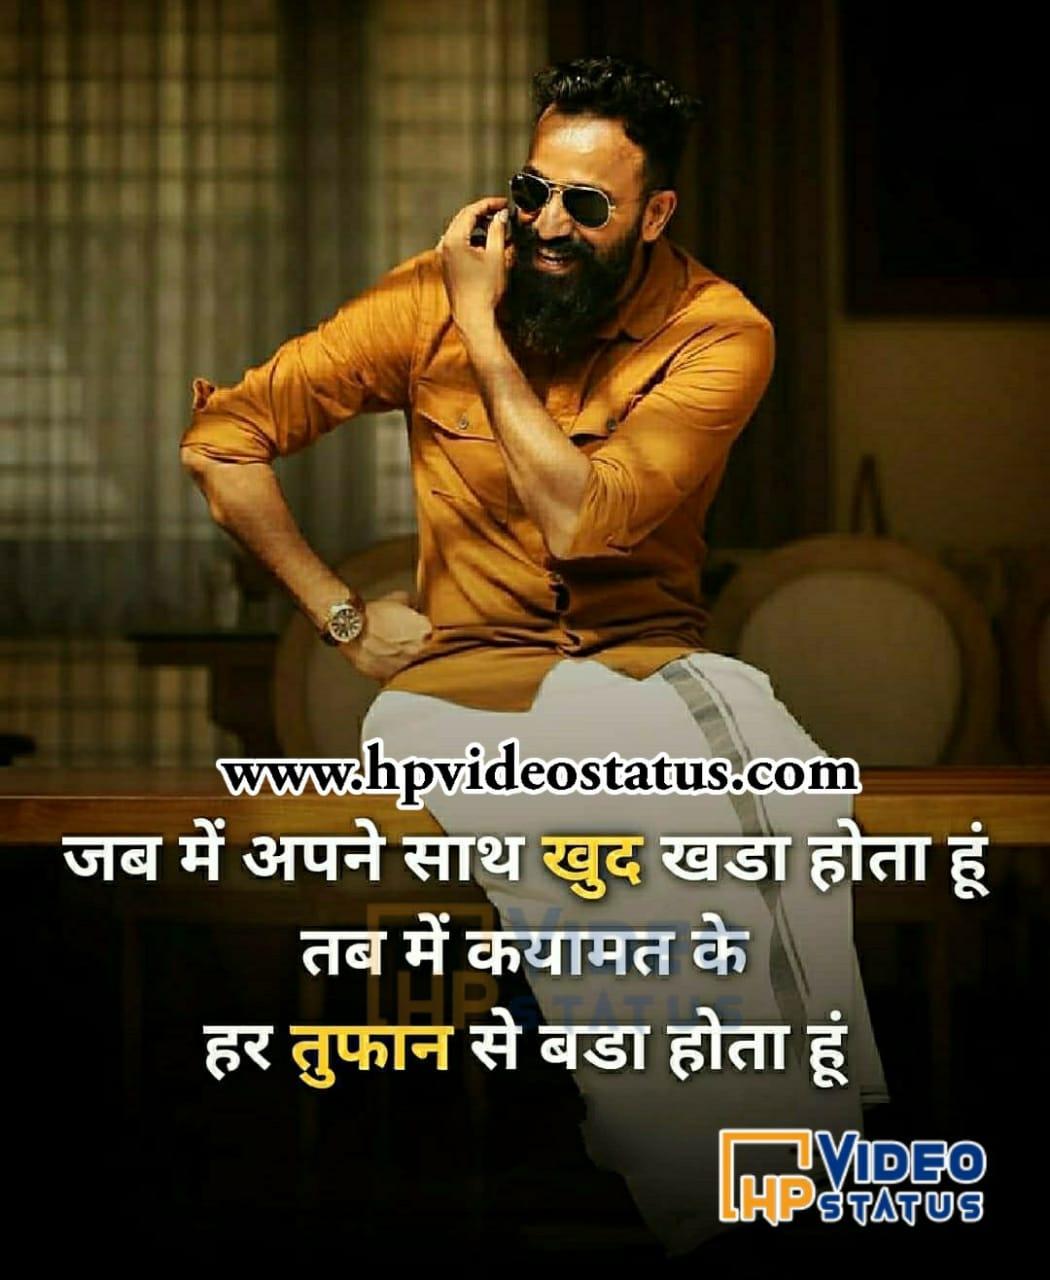 Status in hindi fb attitude